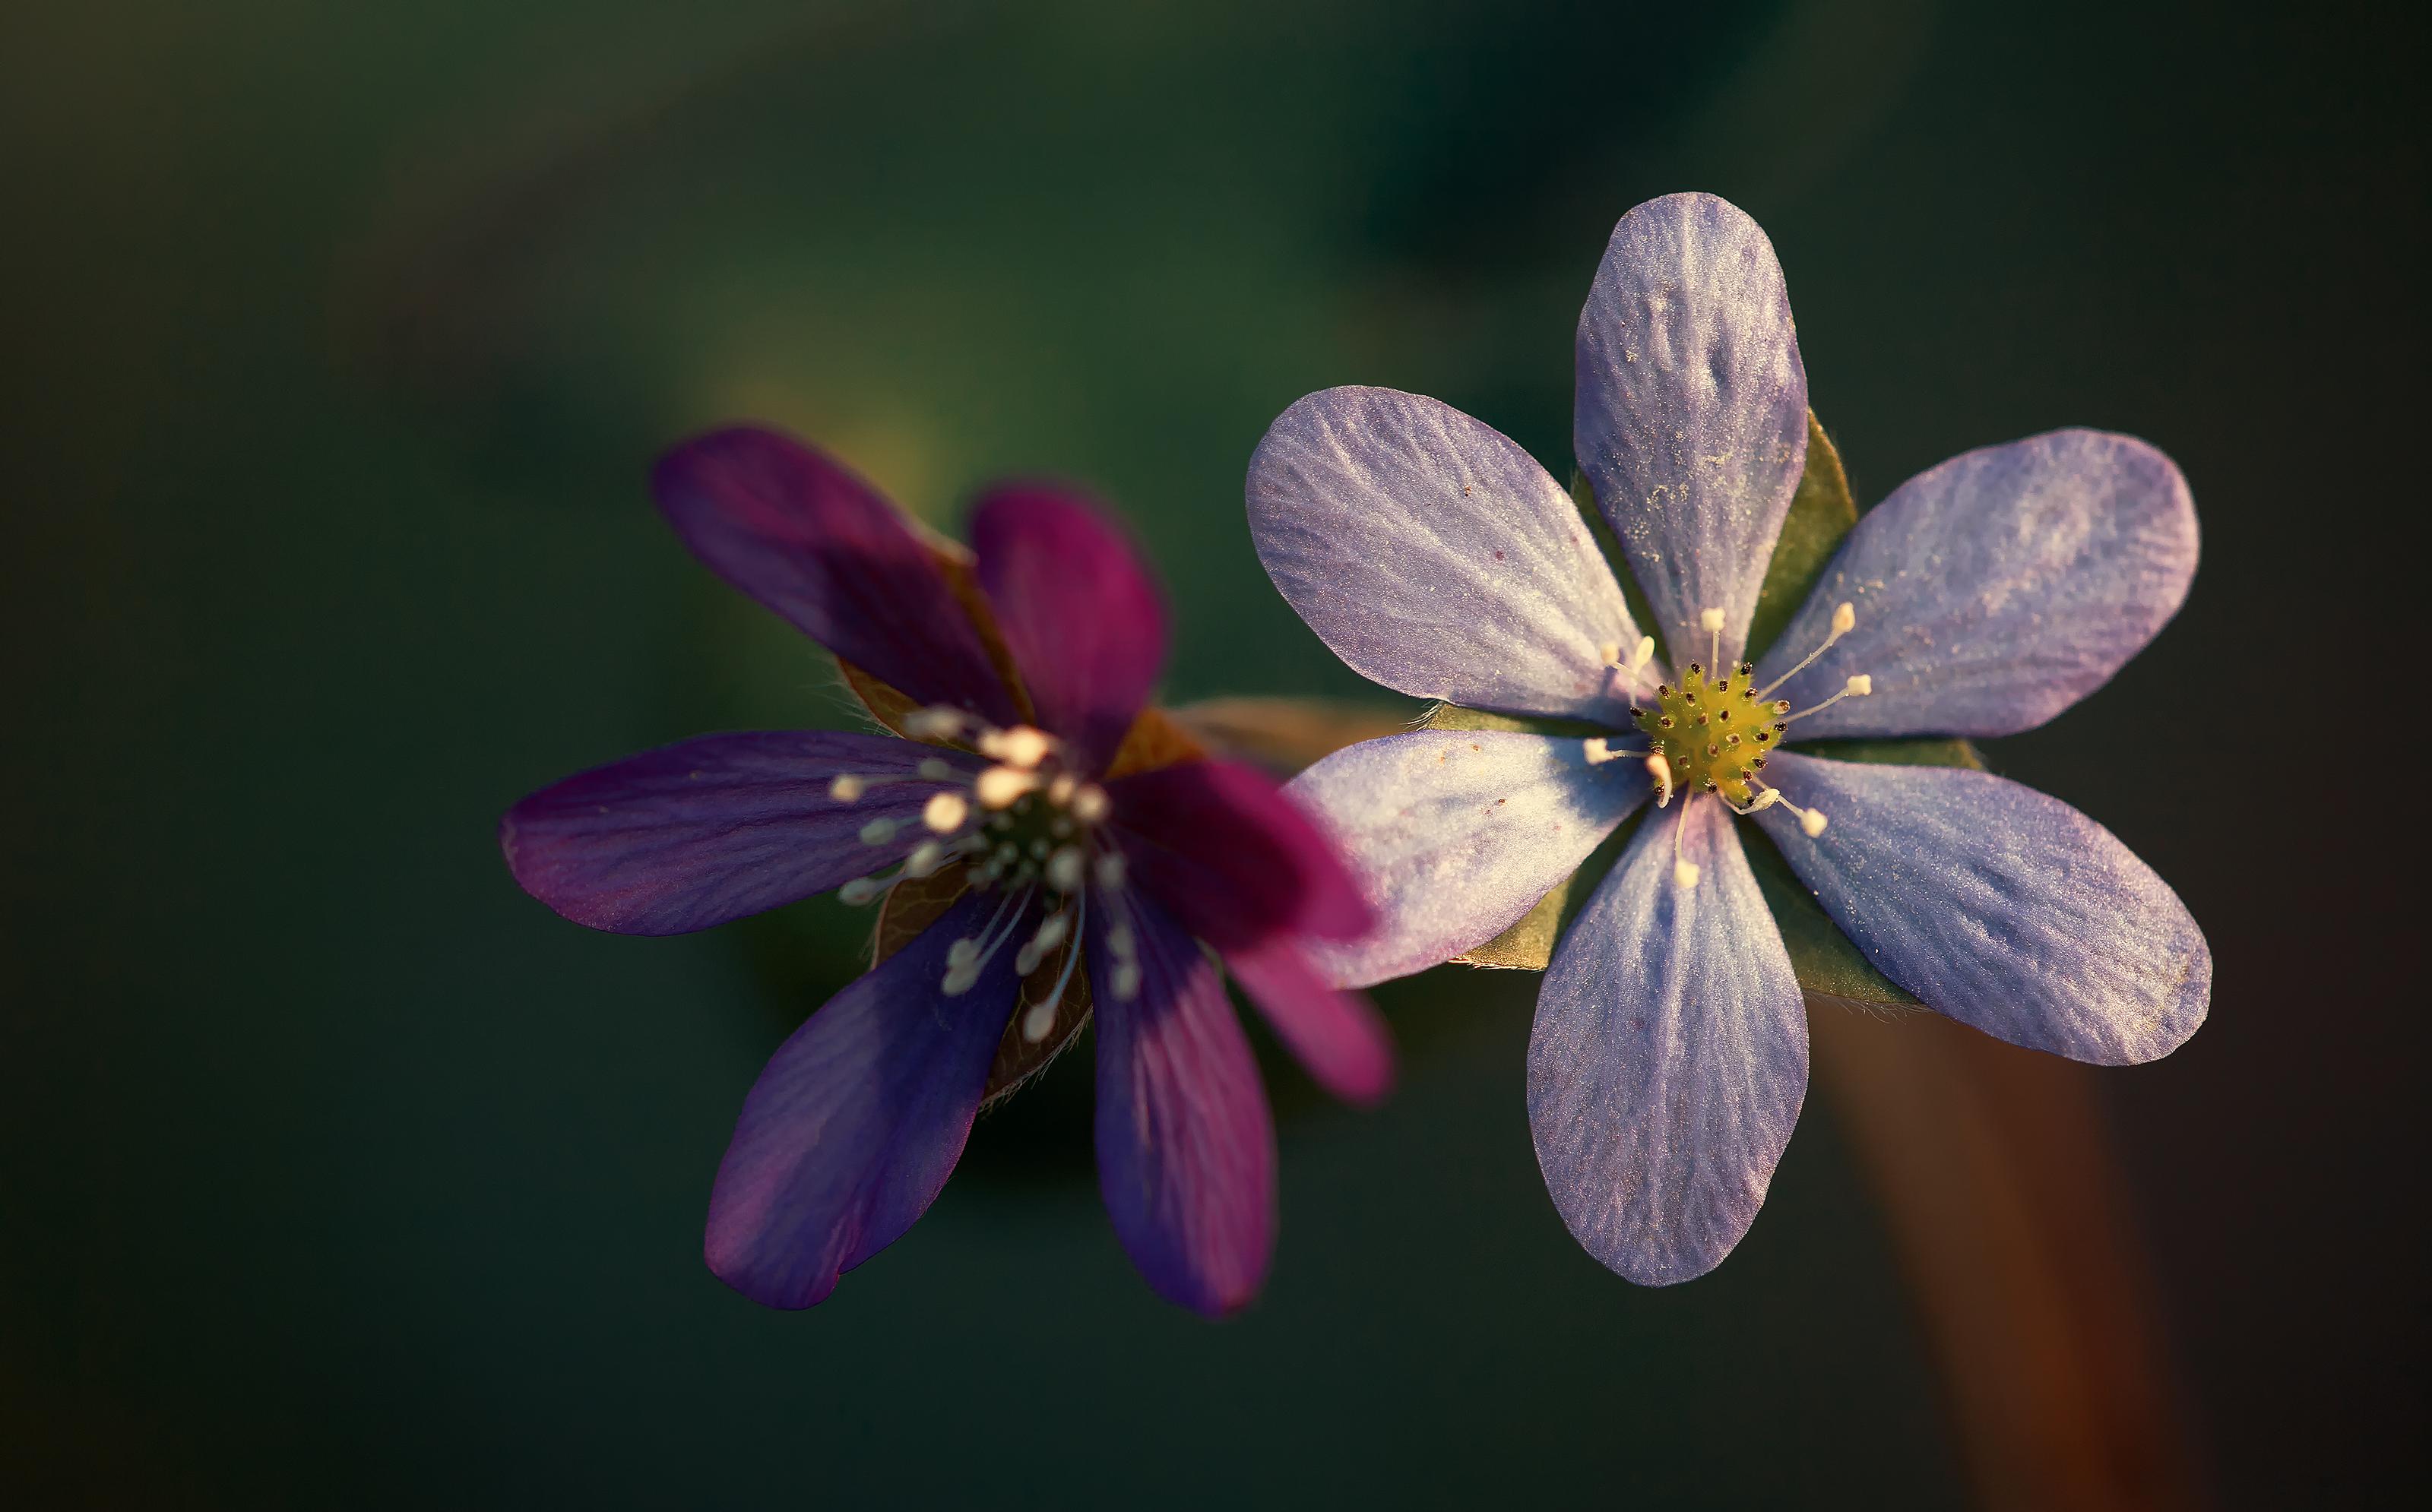 Siniste lillede aeg